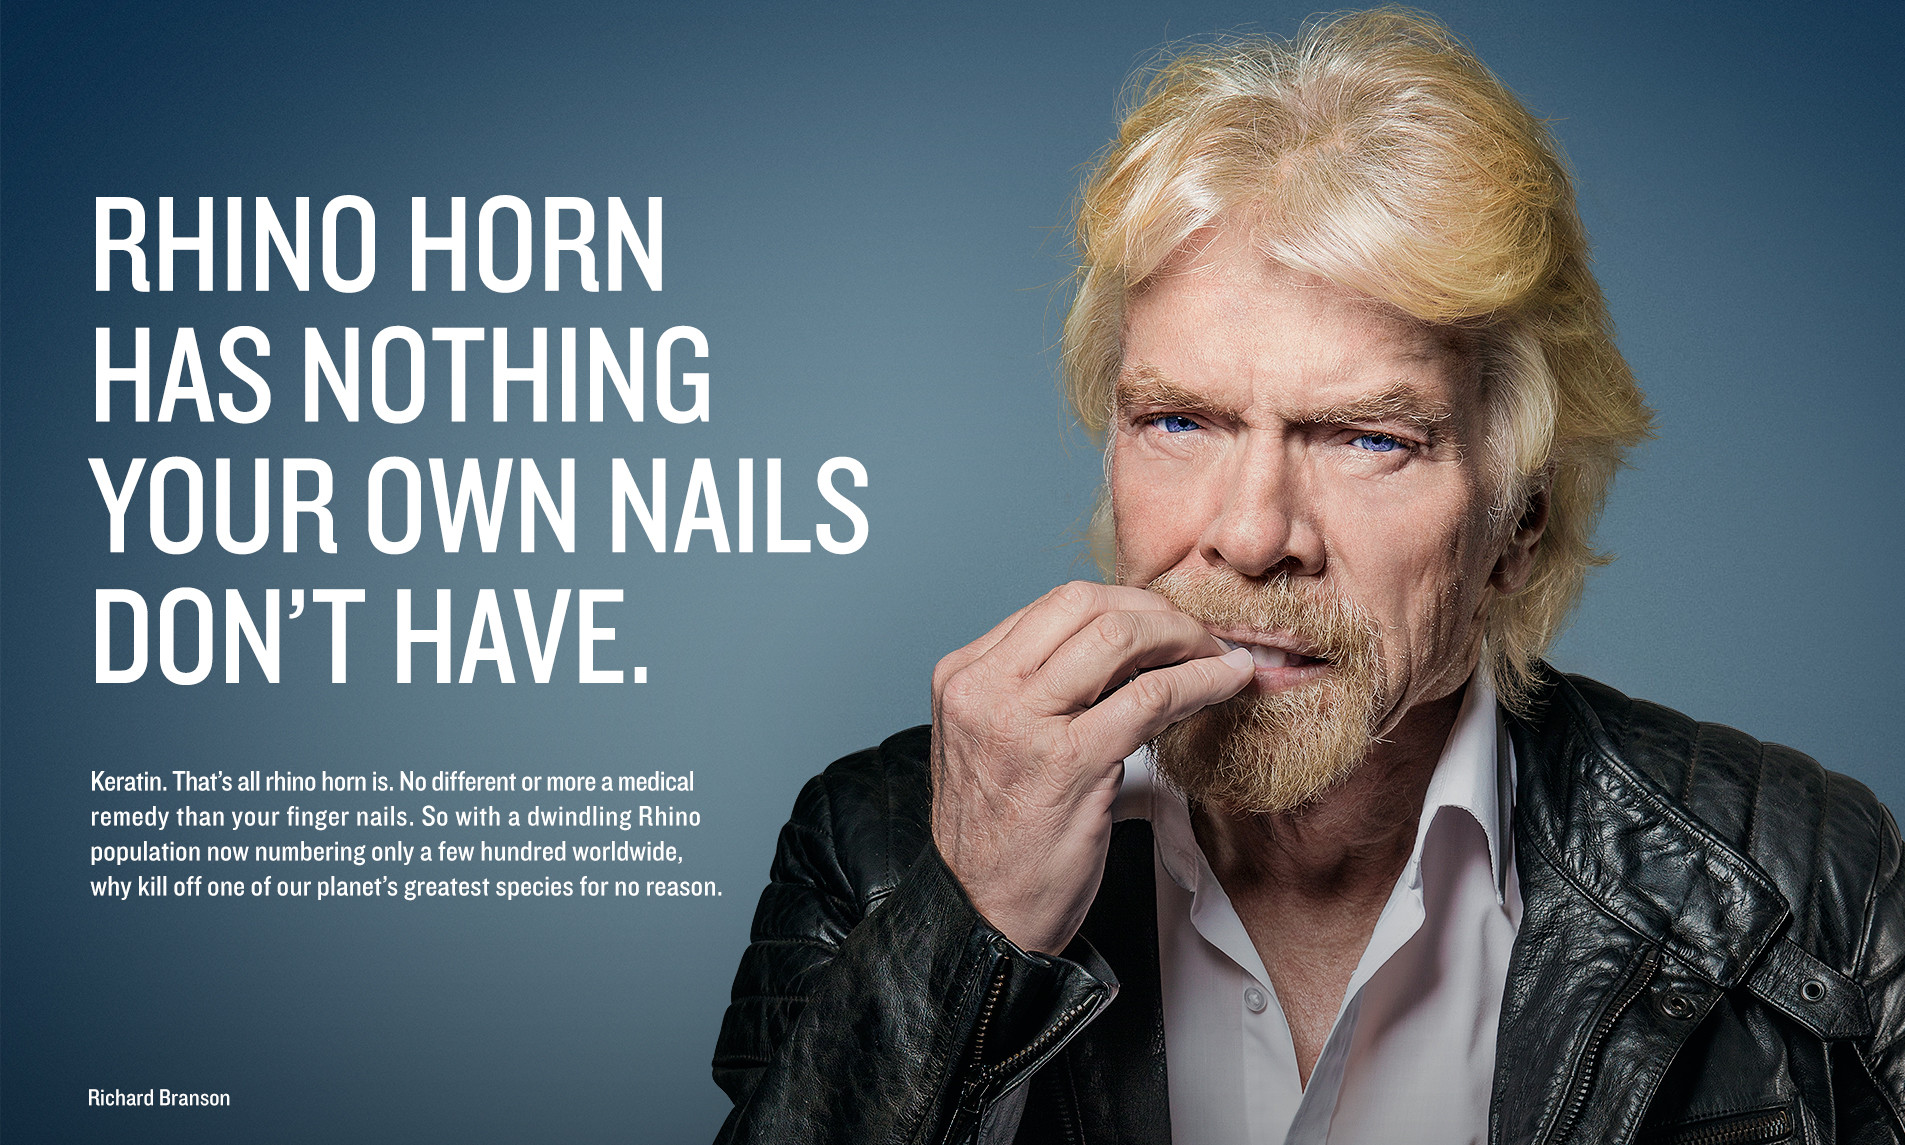 WildAid runs \'Nail Biter\' campaign to save rhinos | Marketing ...